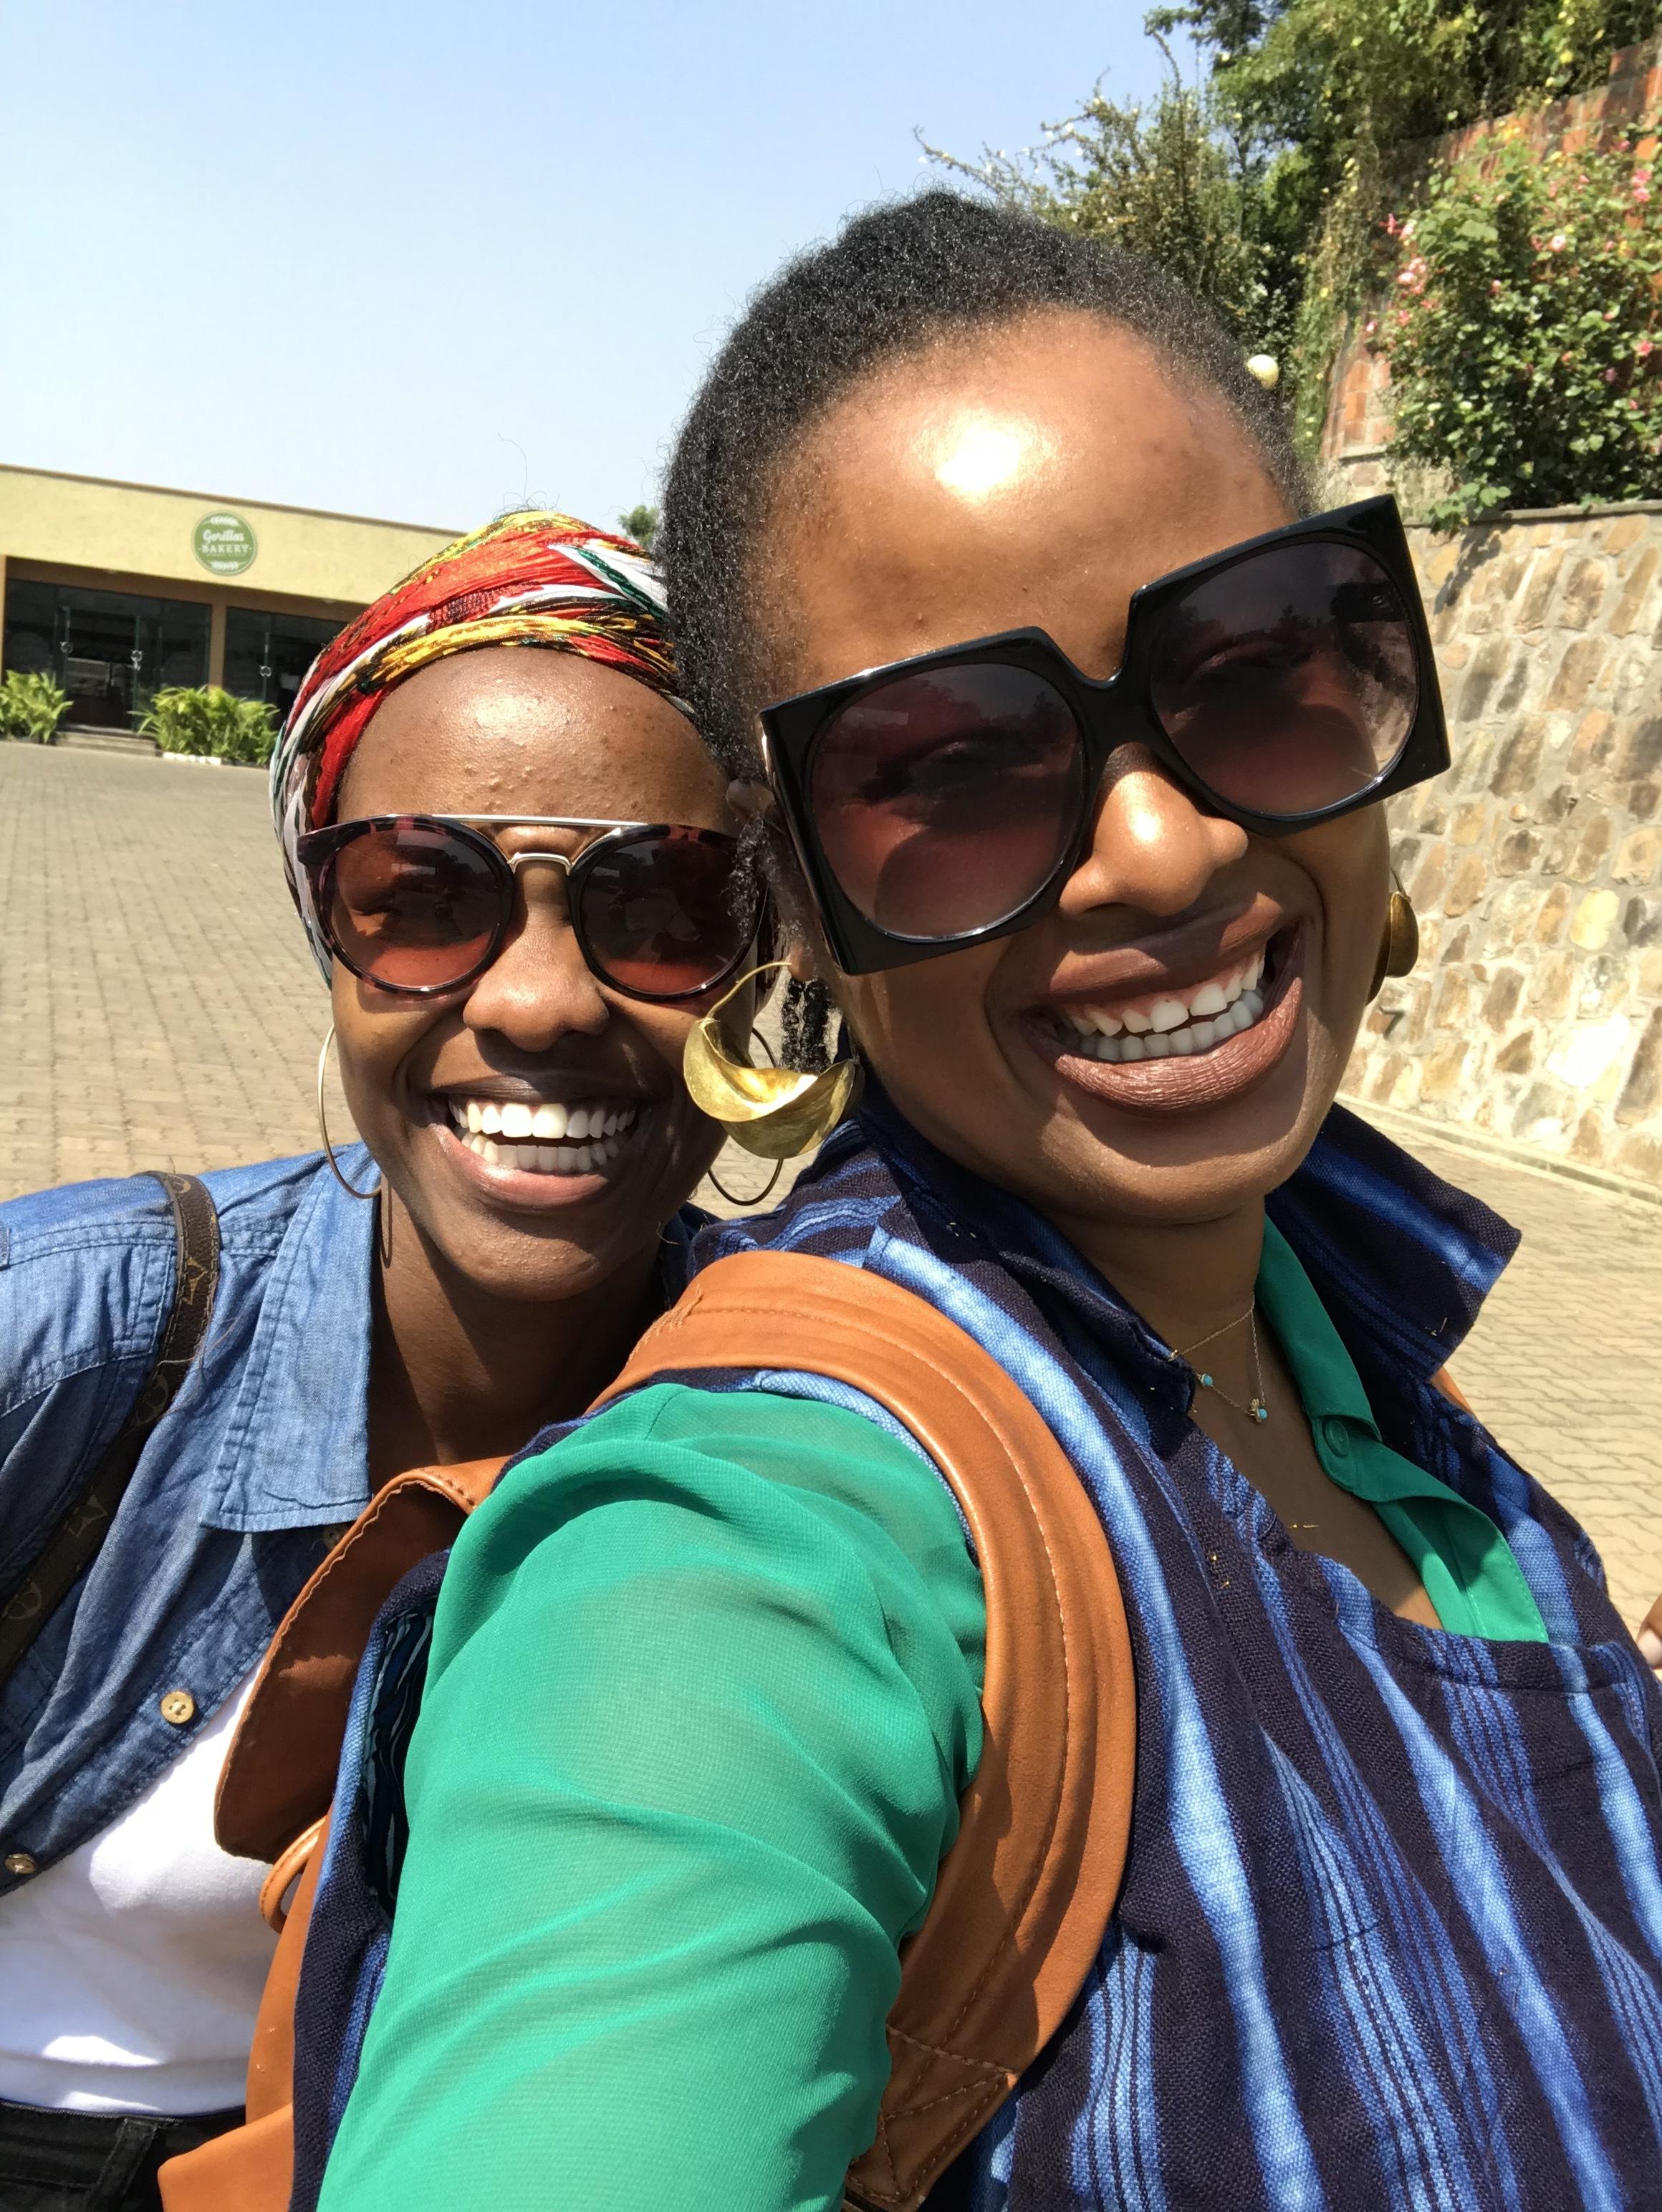 IMG_6007 2VickieRemoe-travel-kigali-rwanda-review-kwibohora25-hotels-africa.JPG